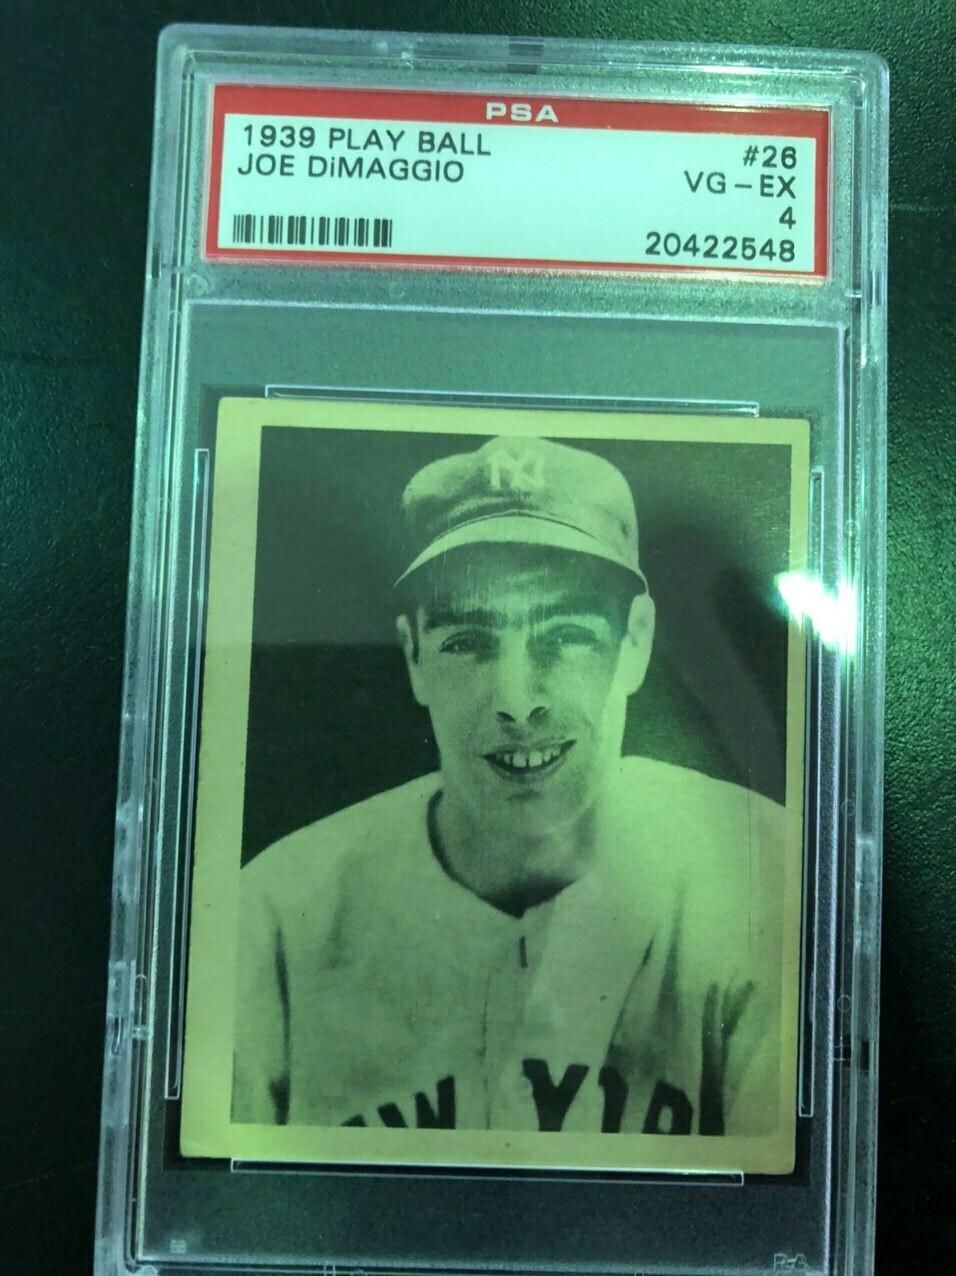 1939 Playball #26 Joe DiMaggio, PSA graded 4, $1500